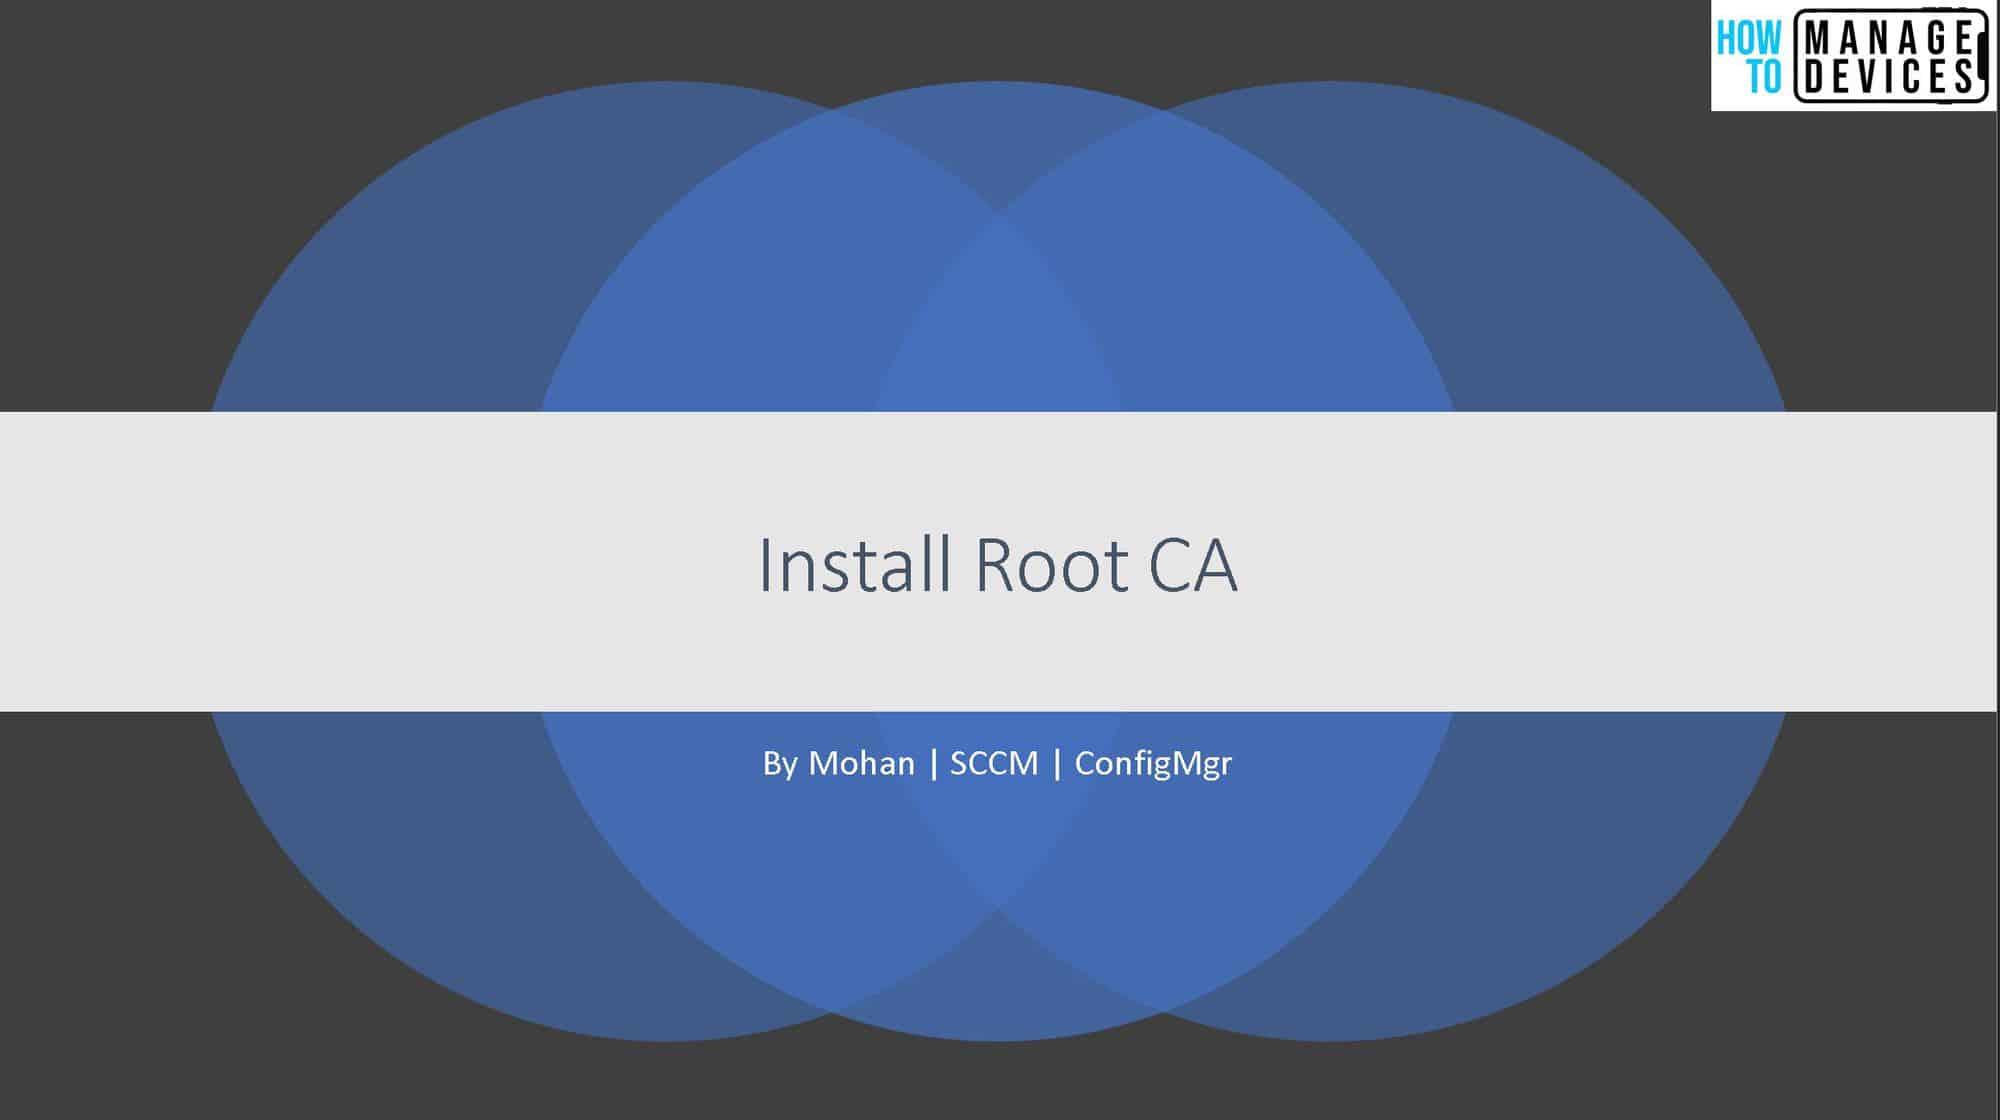 Install Root CA